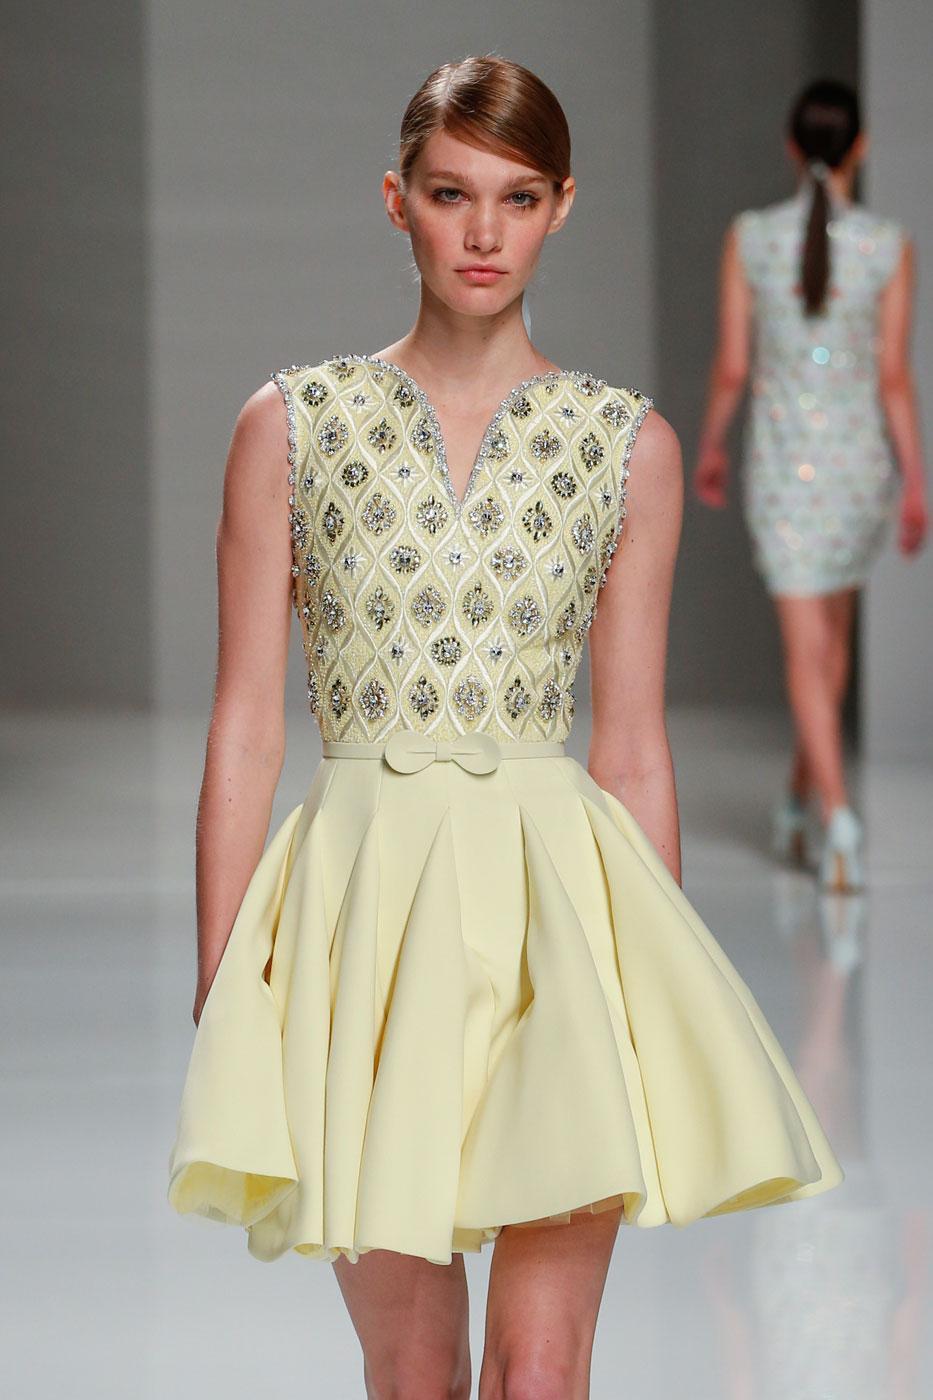 Georges-Hobeika-fashion-runway-show-haute-couture-paris-spring-2015-the-impression-18